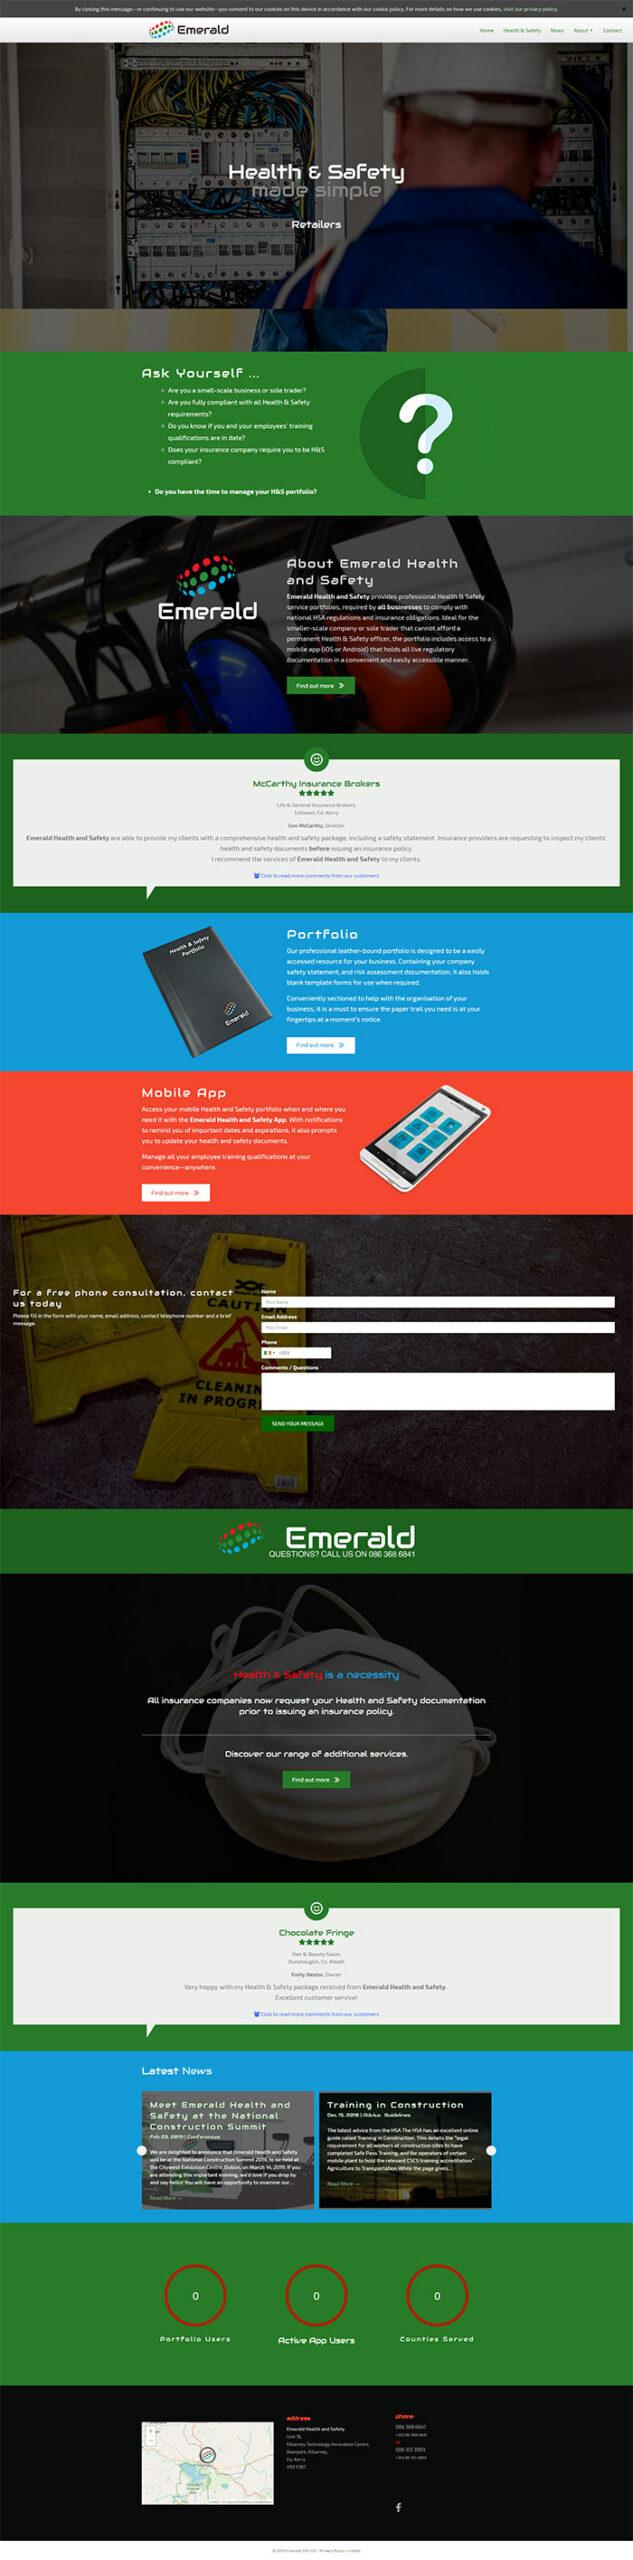 Emerald SSP